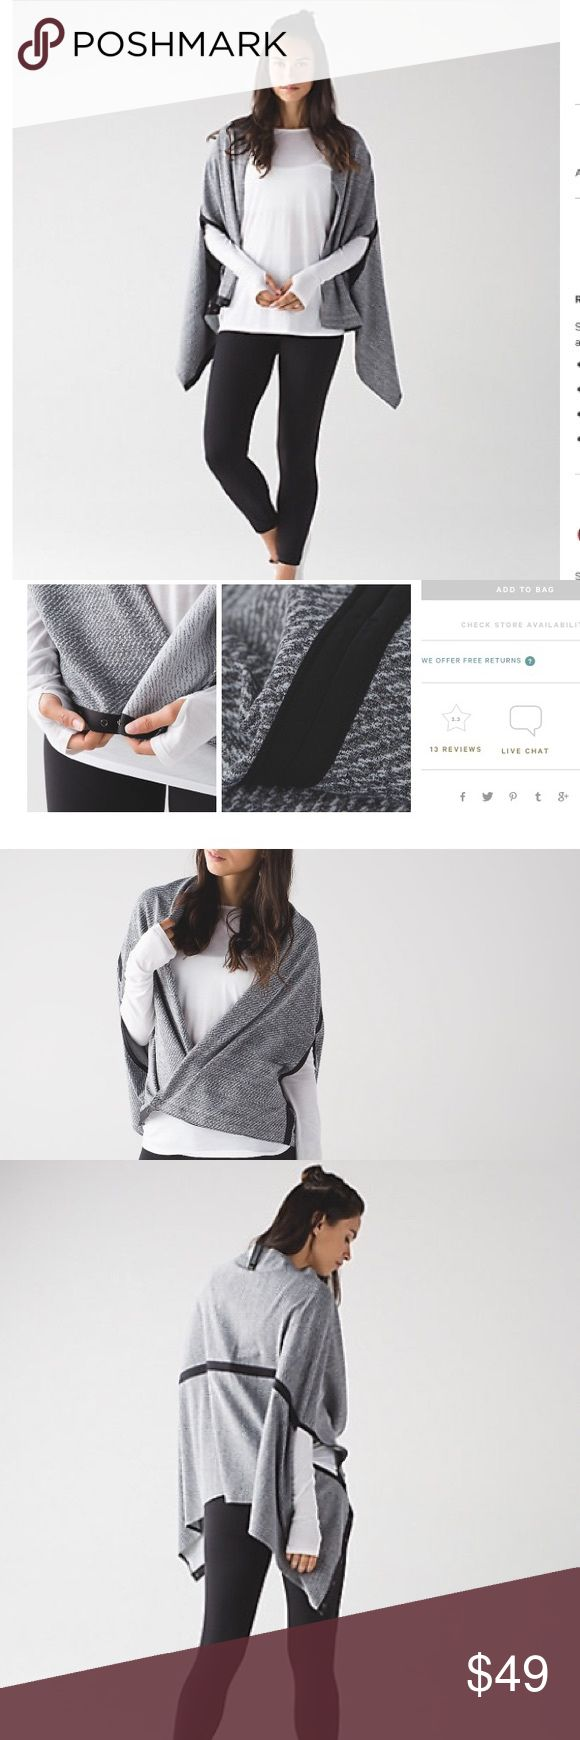 NWT Lululemon Vinyasa Wrap Wear it multiple ways! Brand new with tags!! Firm unless bundled. lululemon athletica Accessories Scarves & Wraps